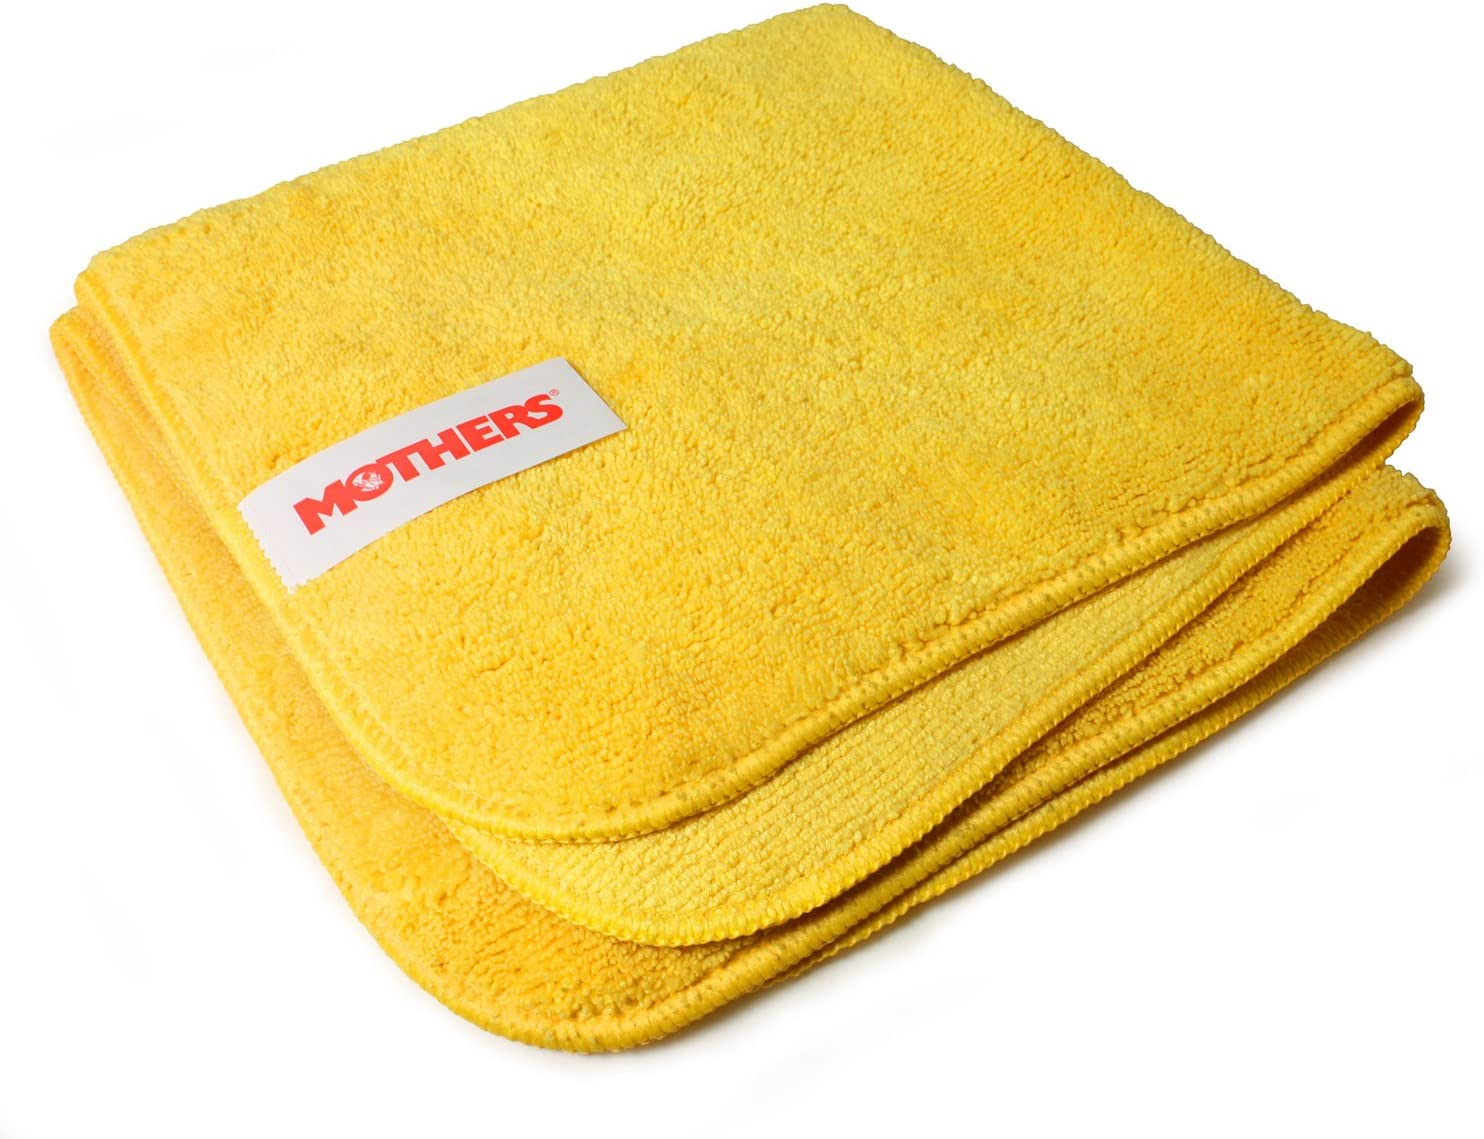 Pack of... Mothers 90-90004 Professional Grade Premium Microfiber Towels Gold,